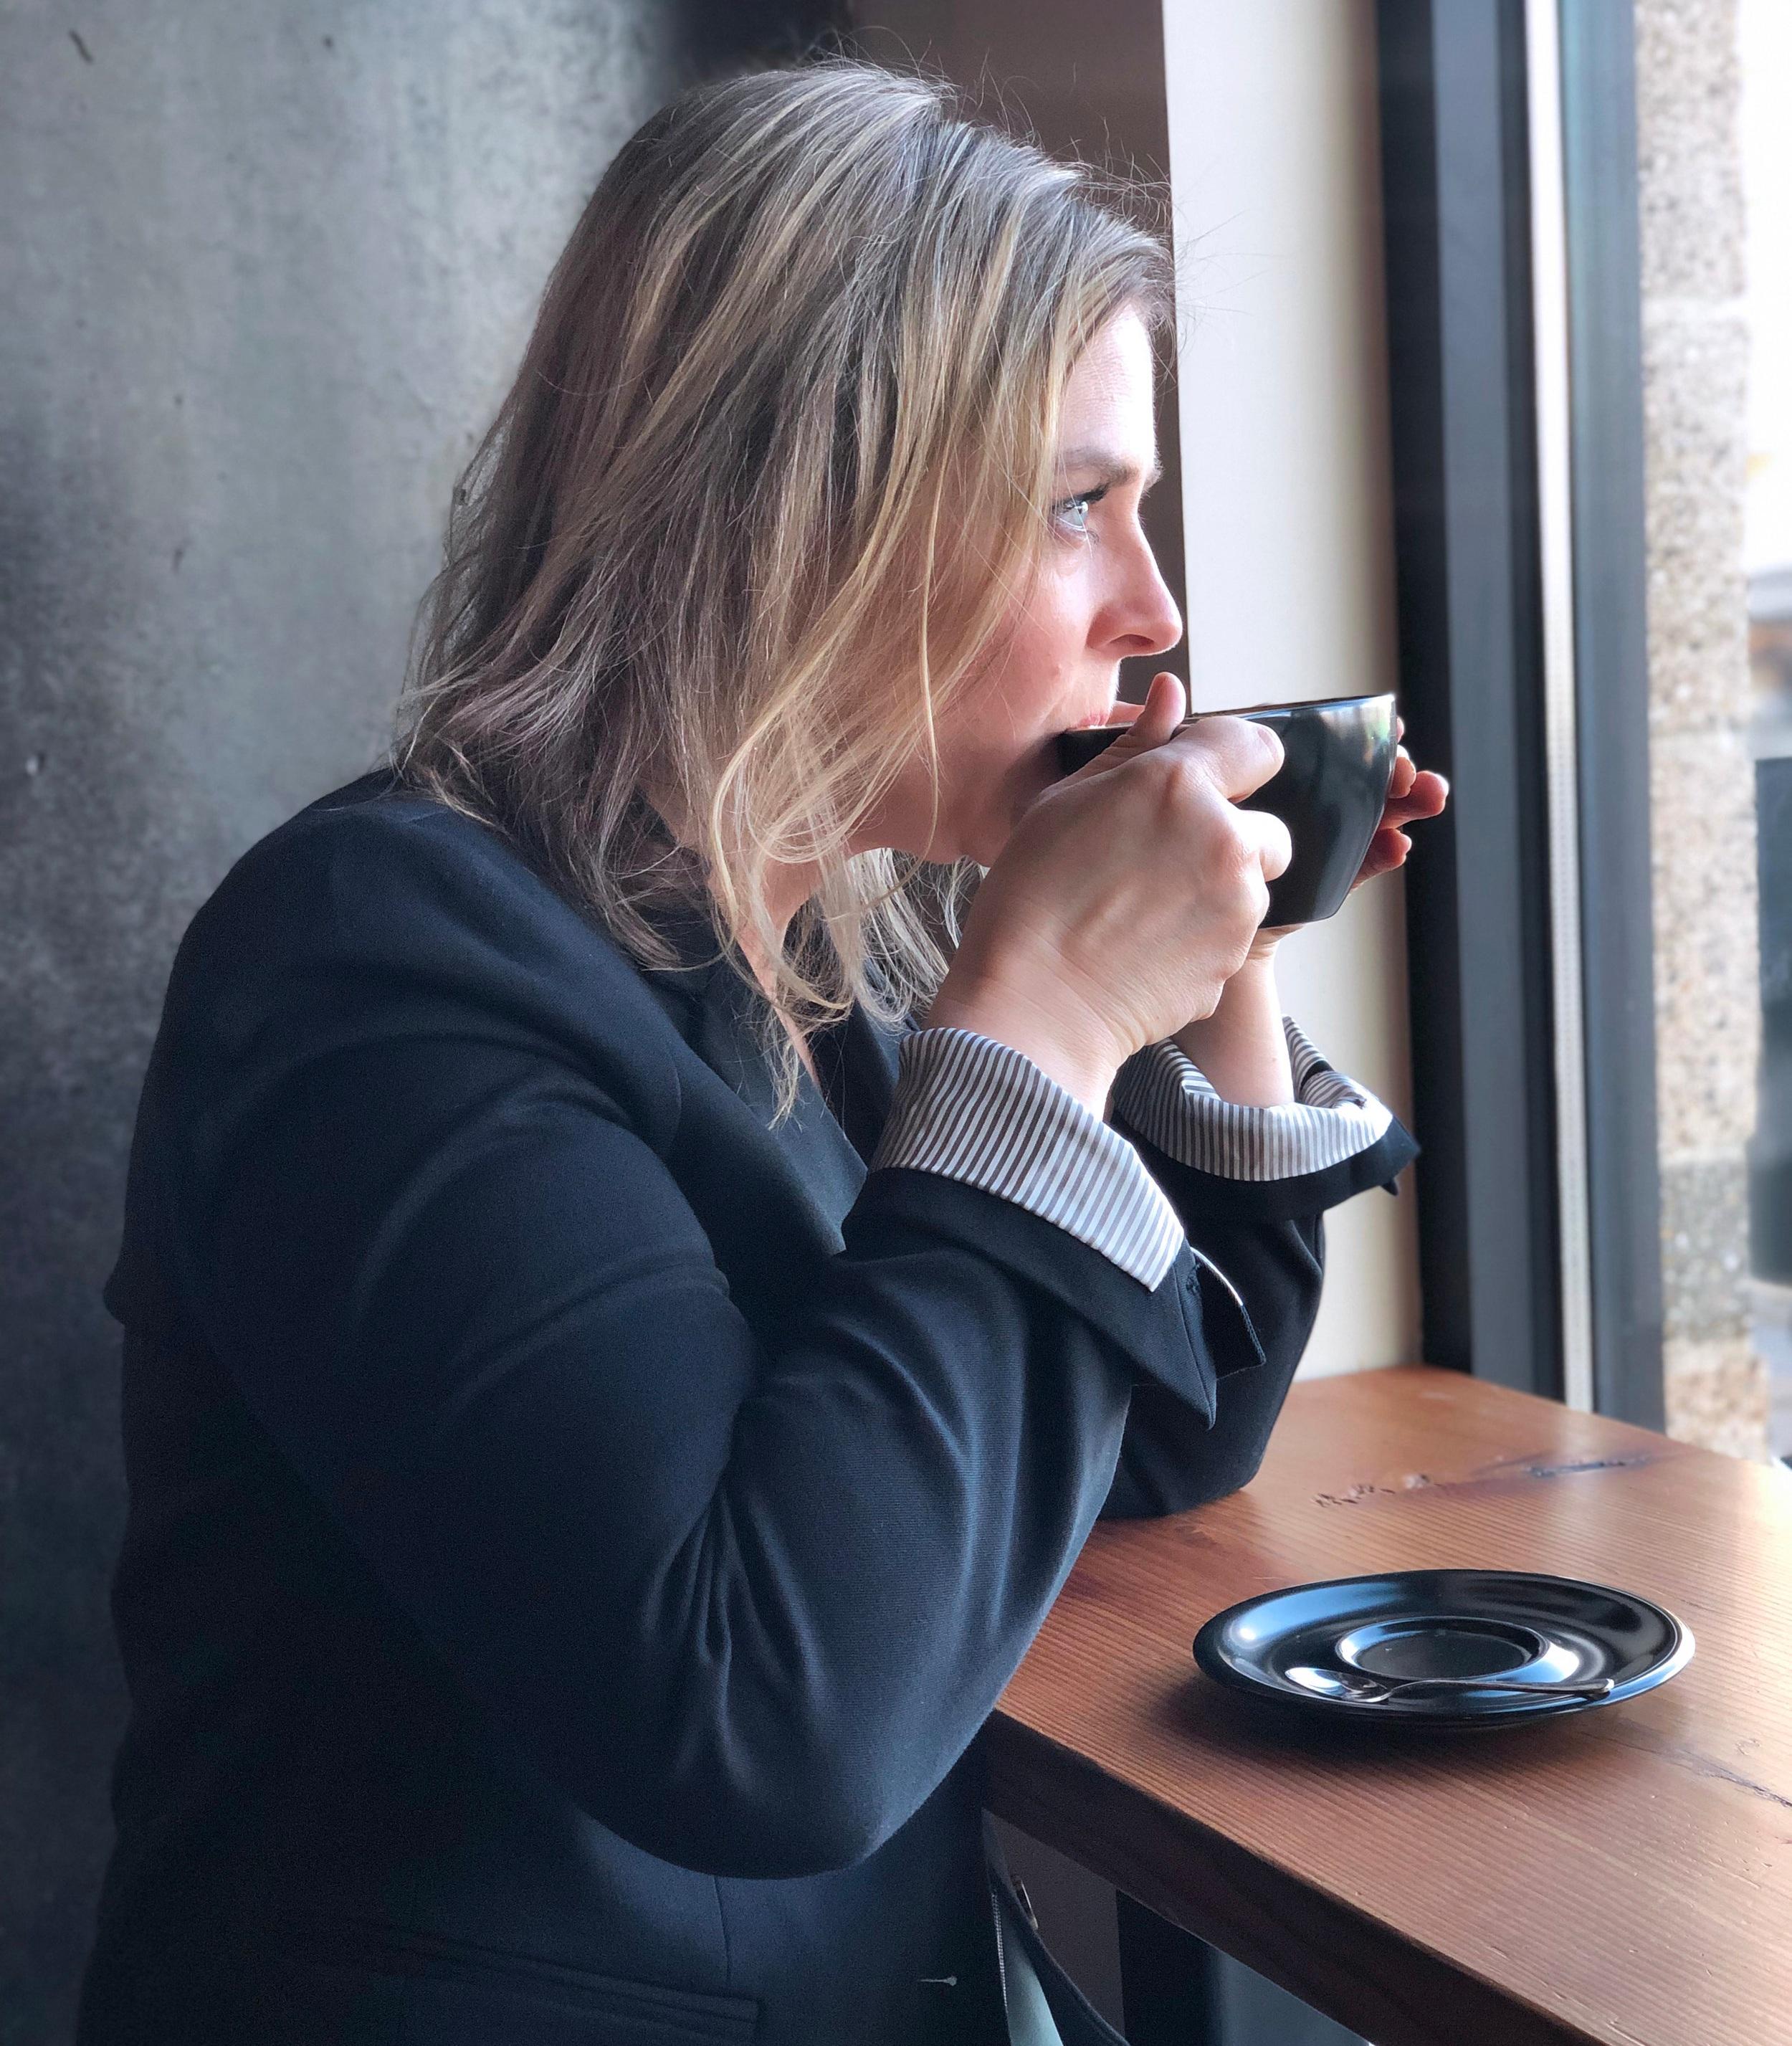 Drinking+Coffee+Looking+Out+Window.jpg